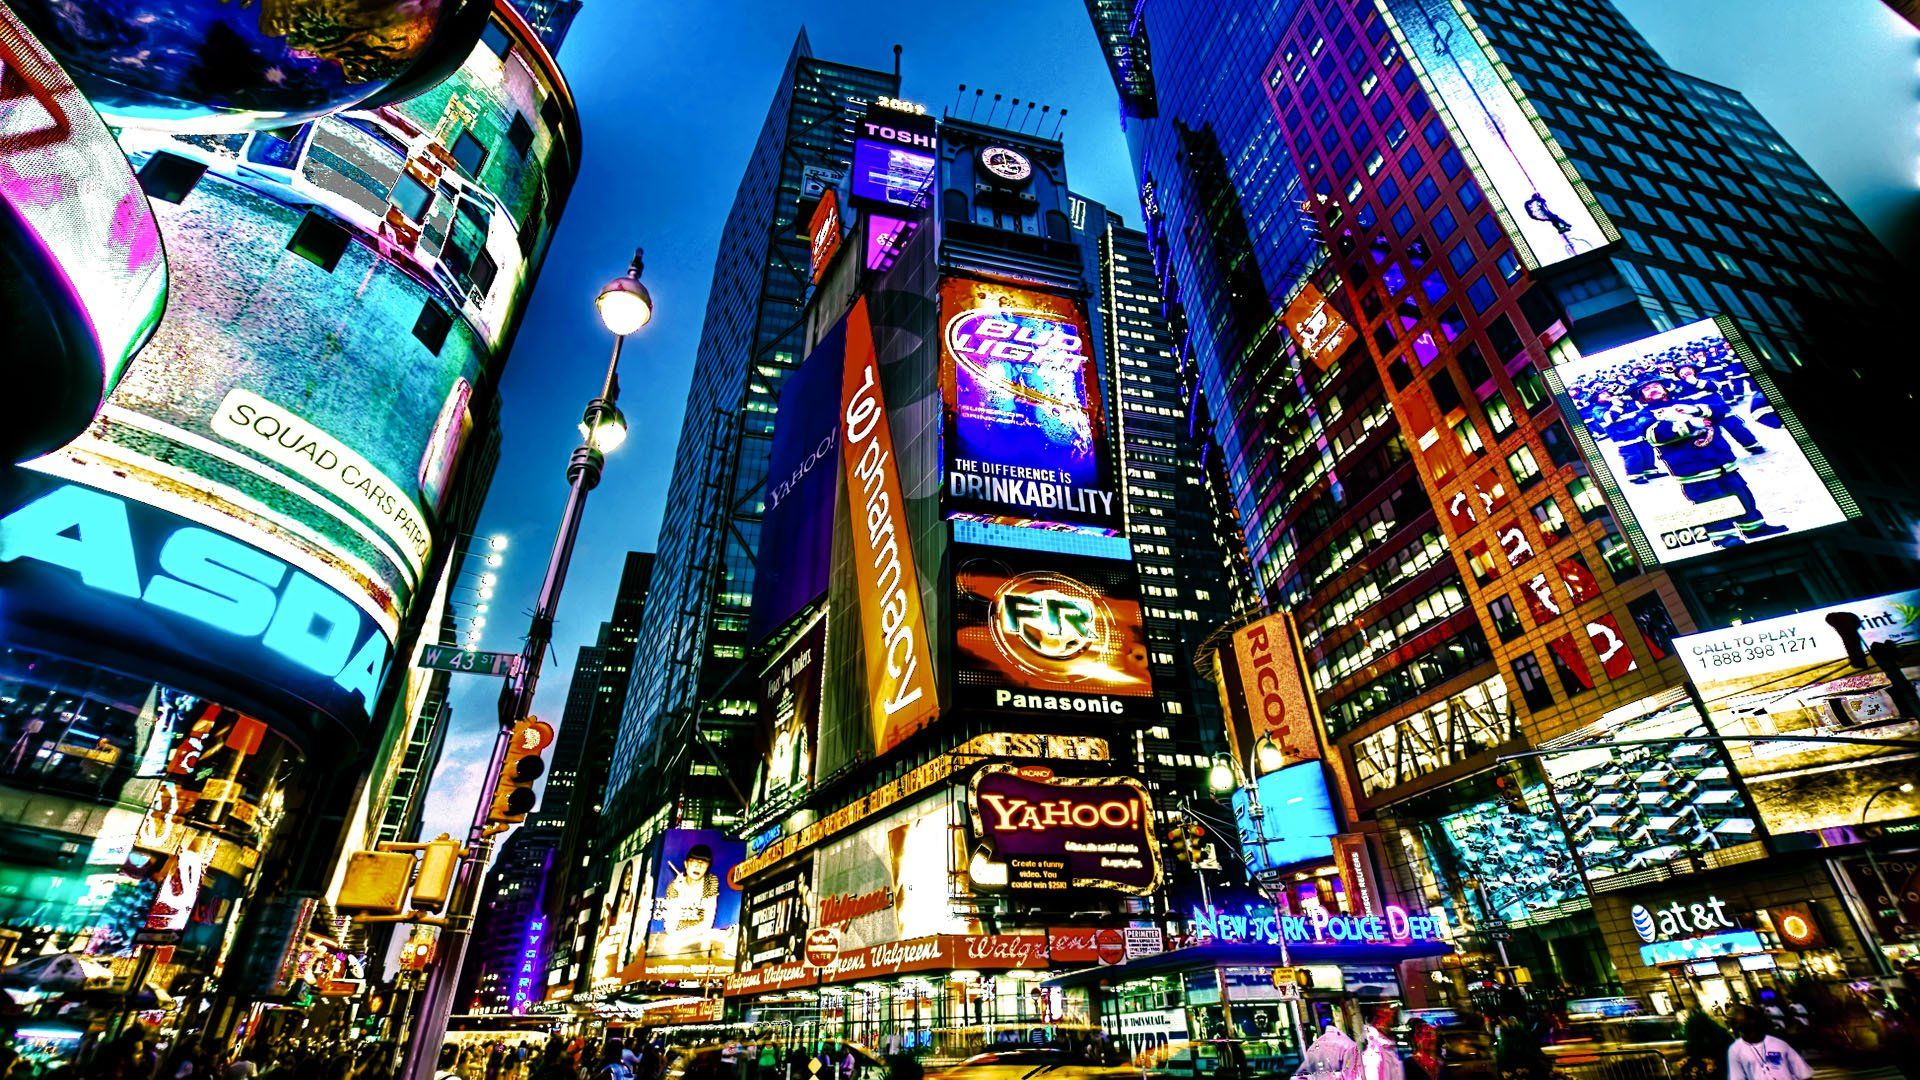 New York Times Square Wallpaper Times Square New York Nyc Times Square City Wallpaper